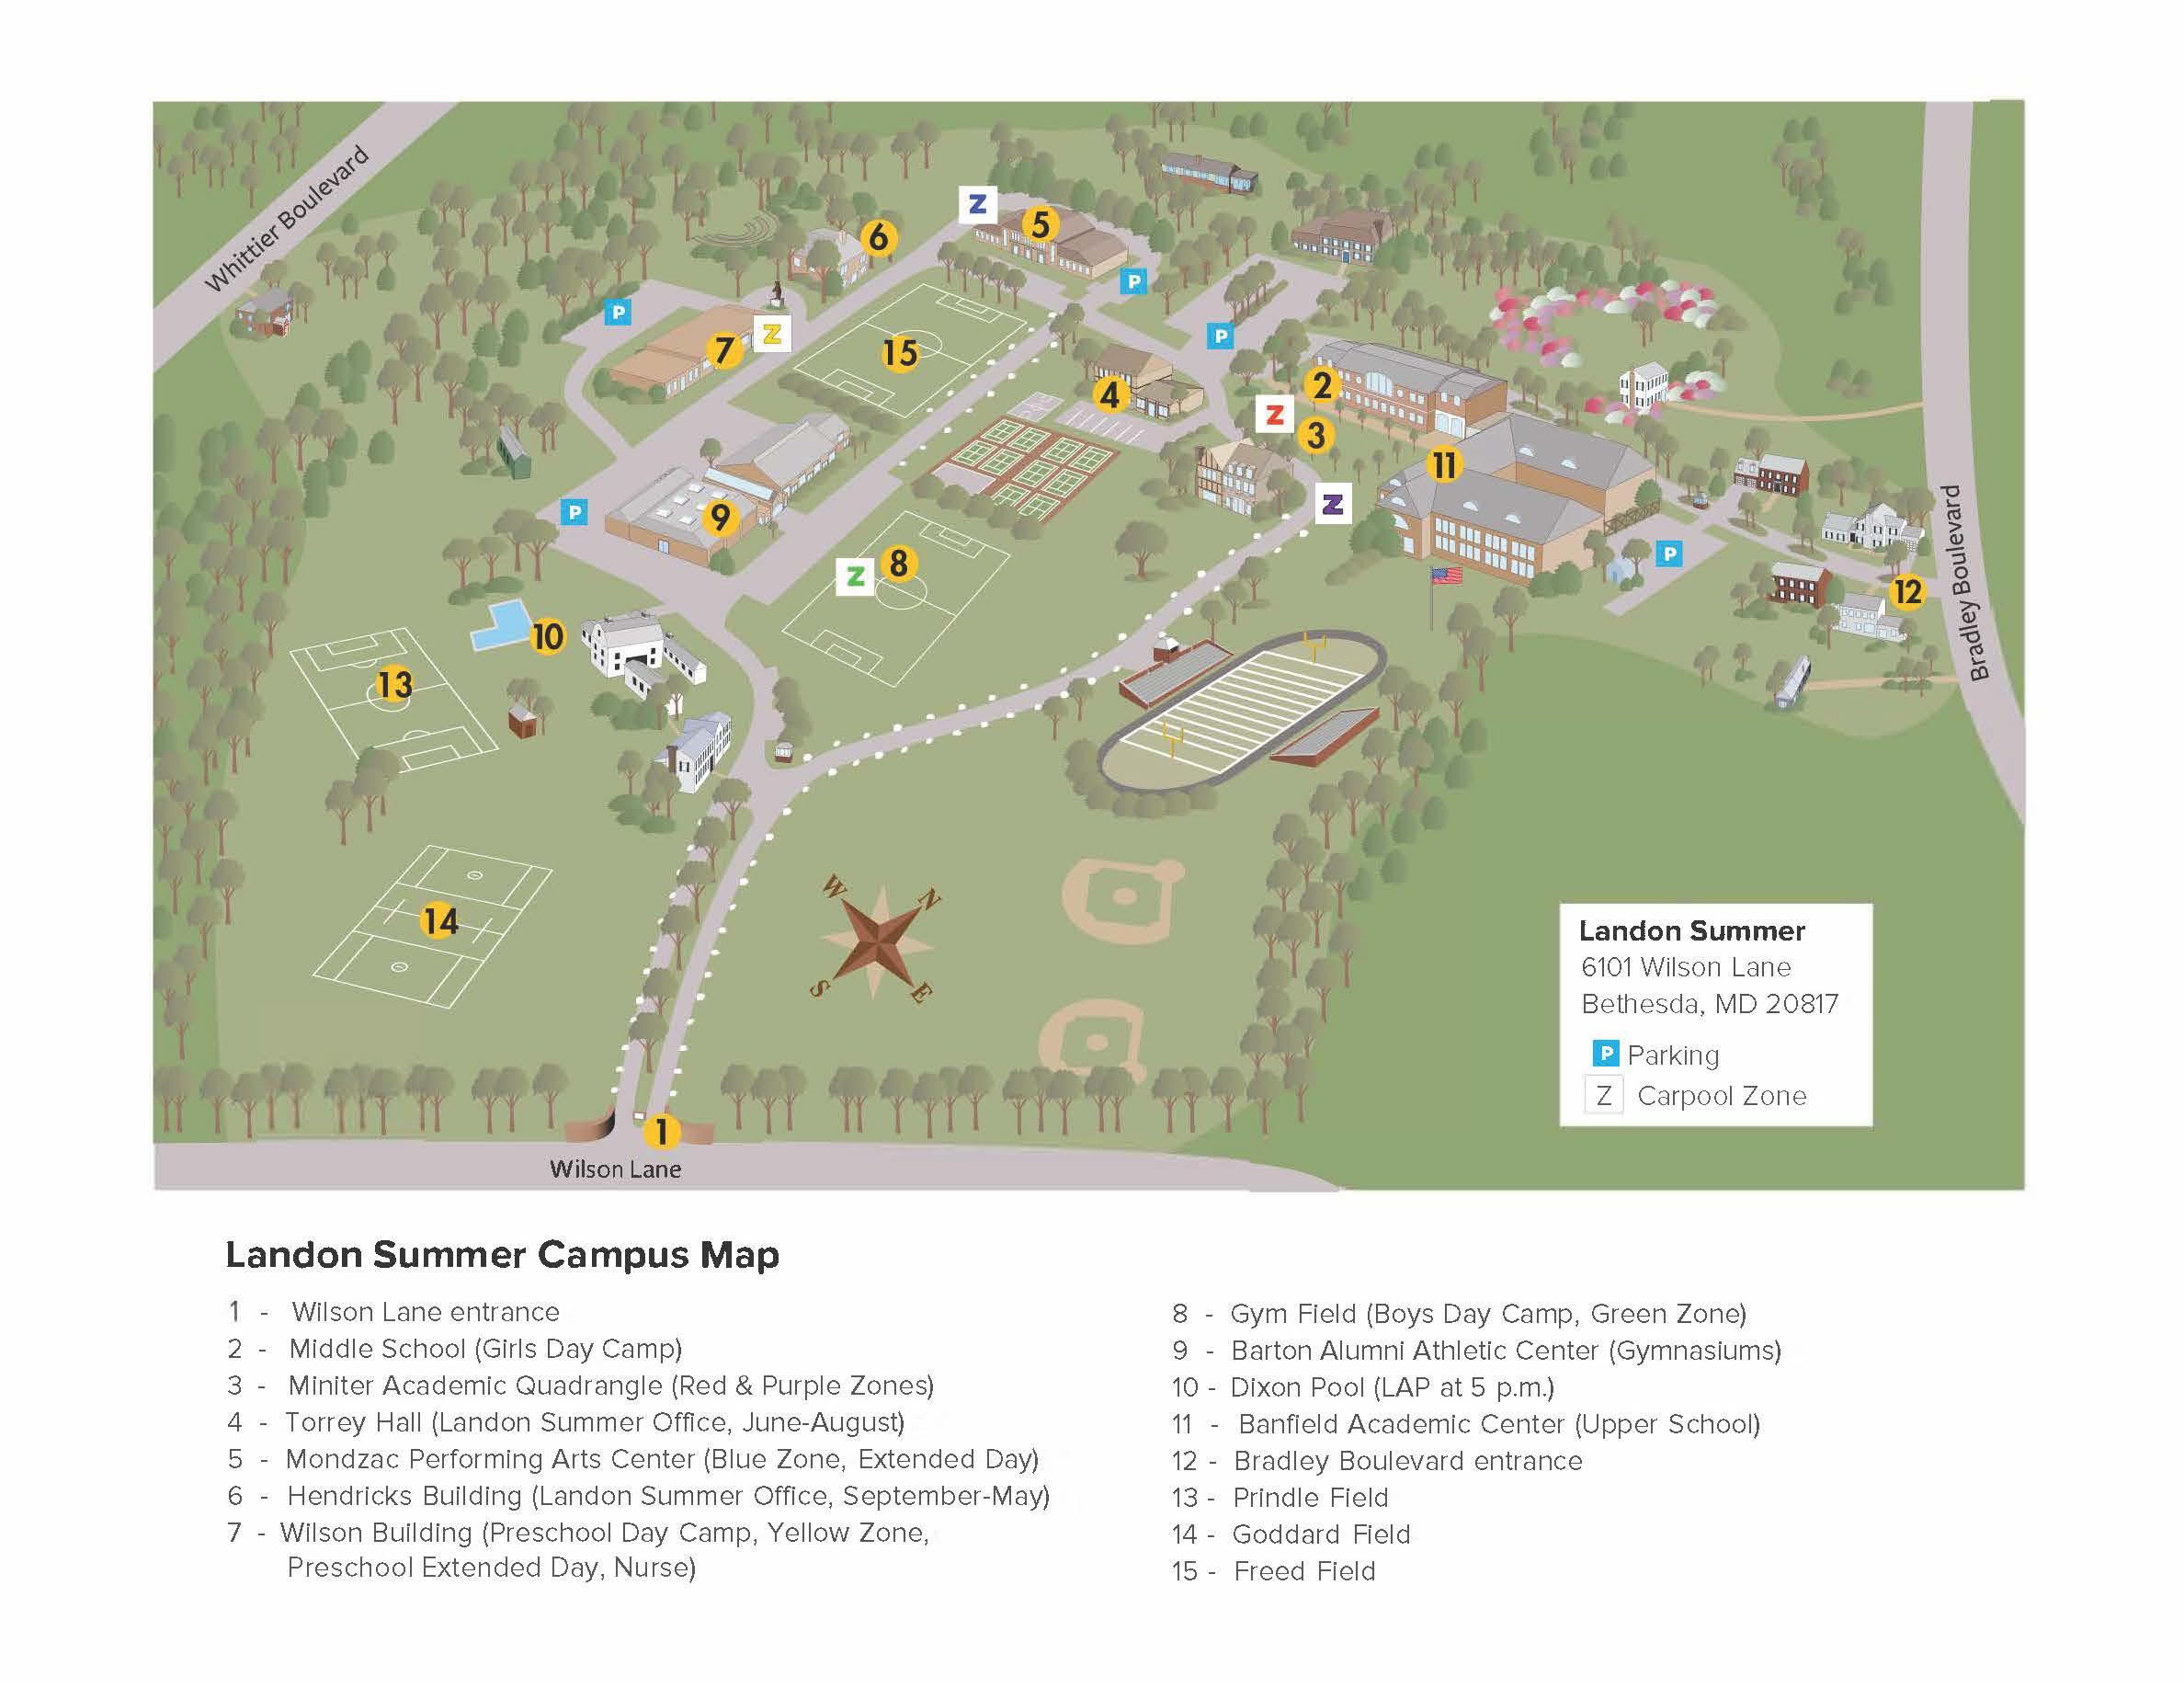 Landon Summer Campus Map